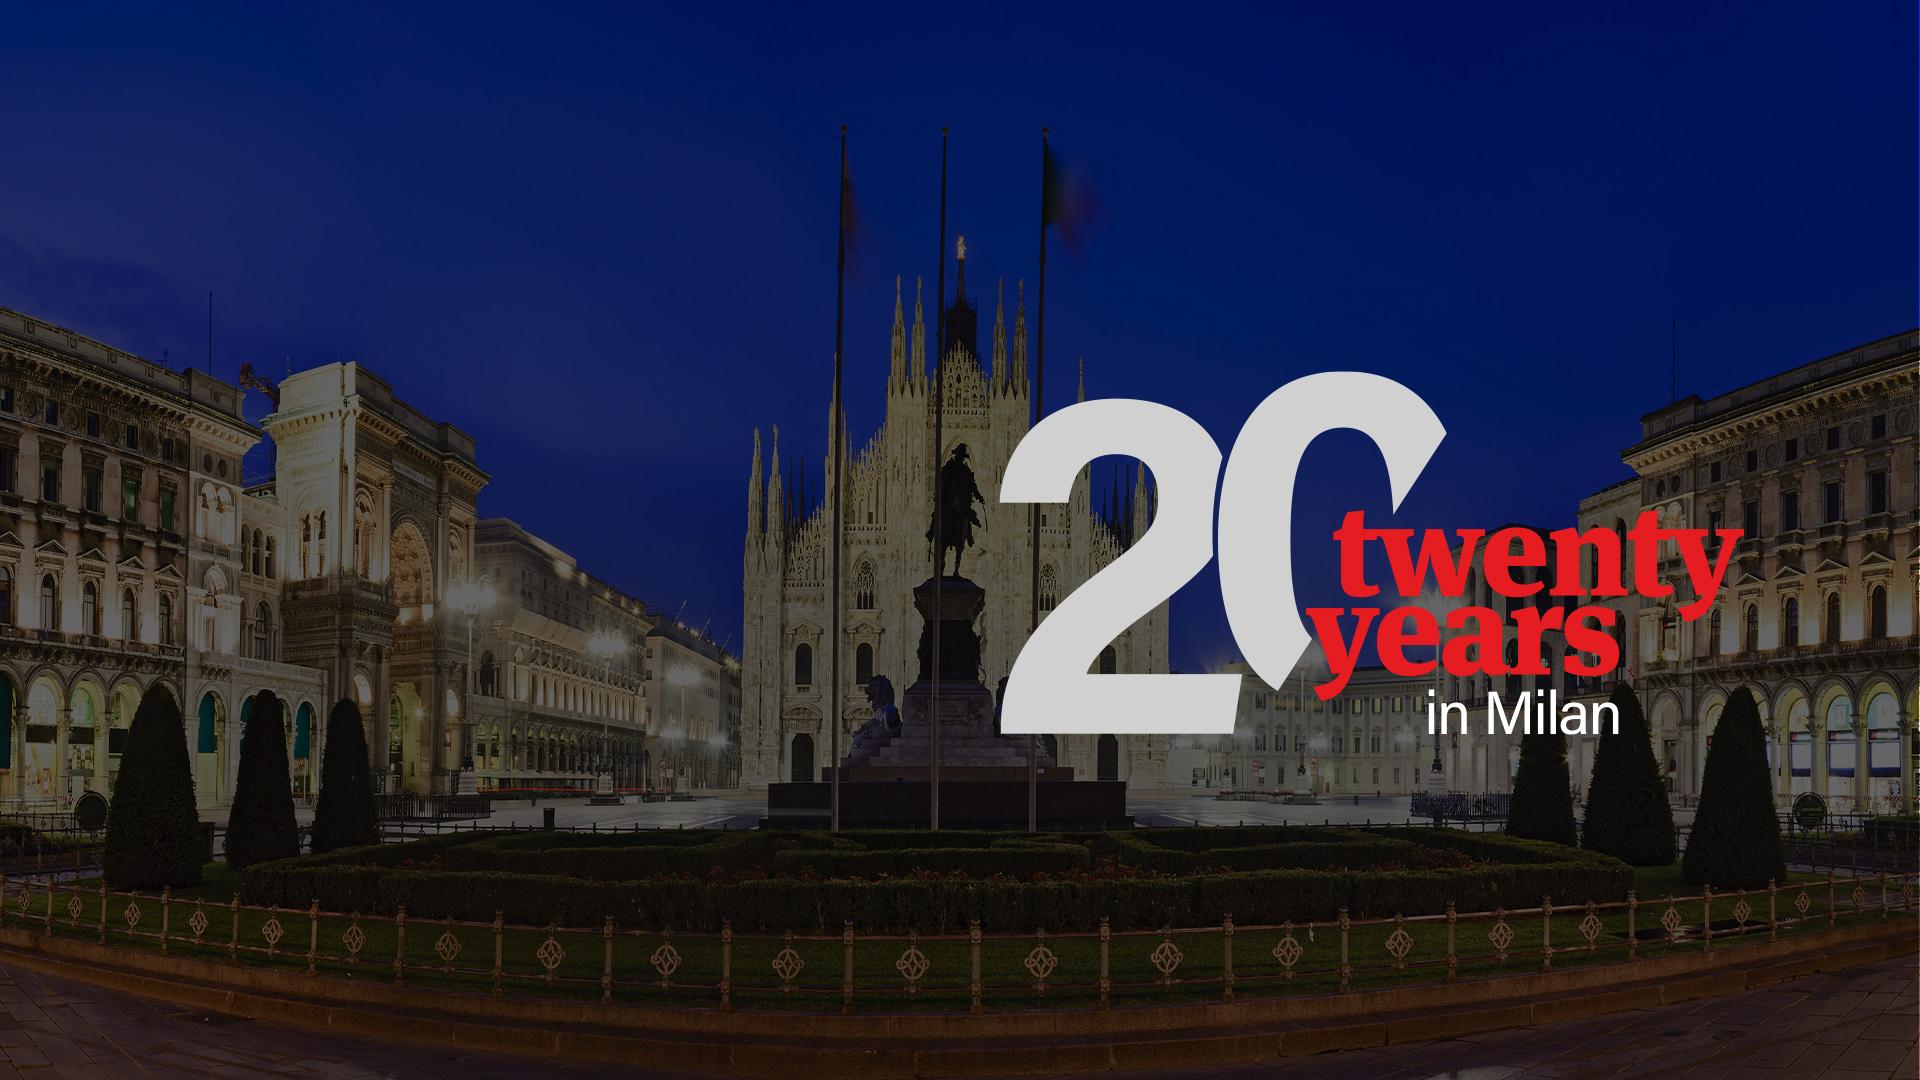 20 years in Milan